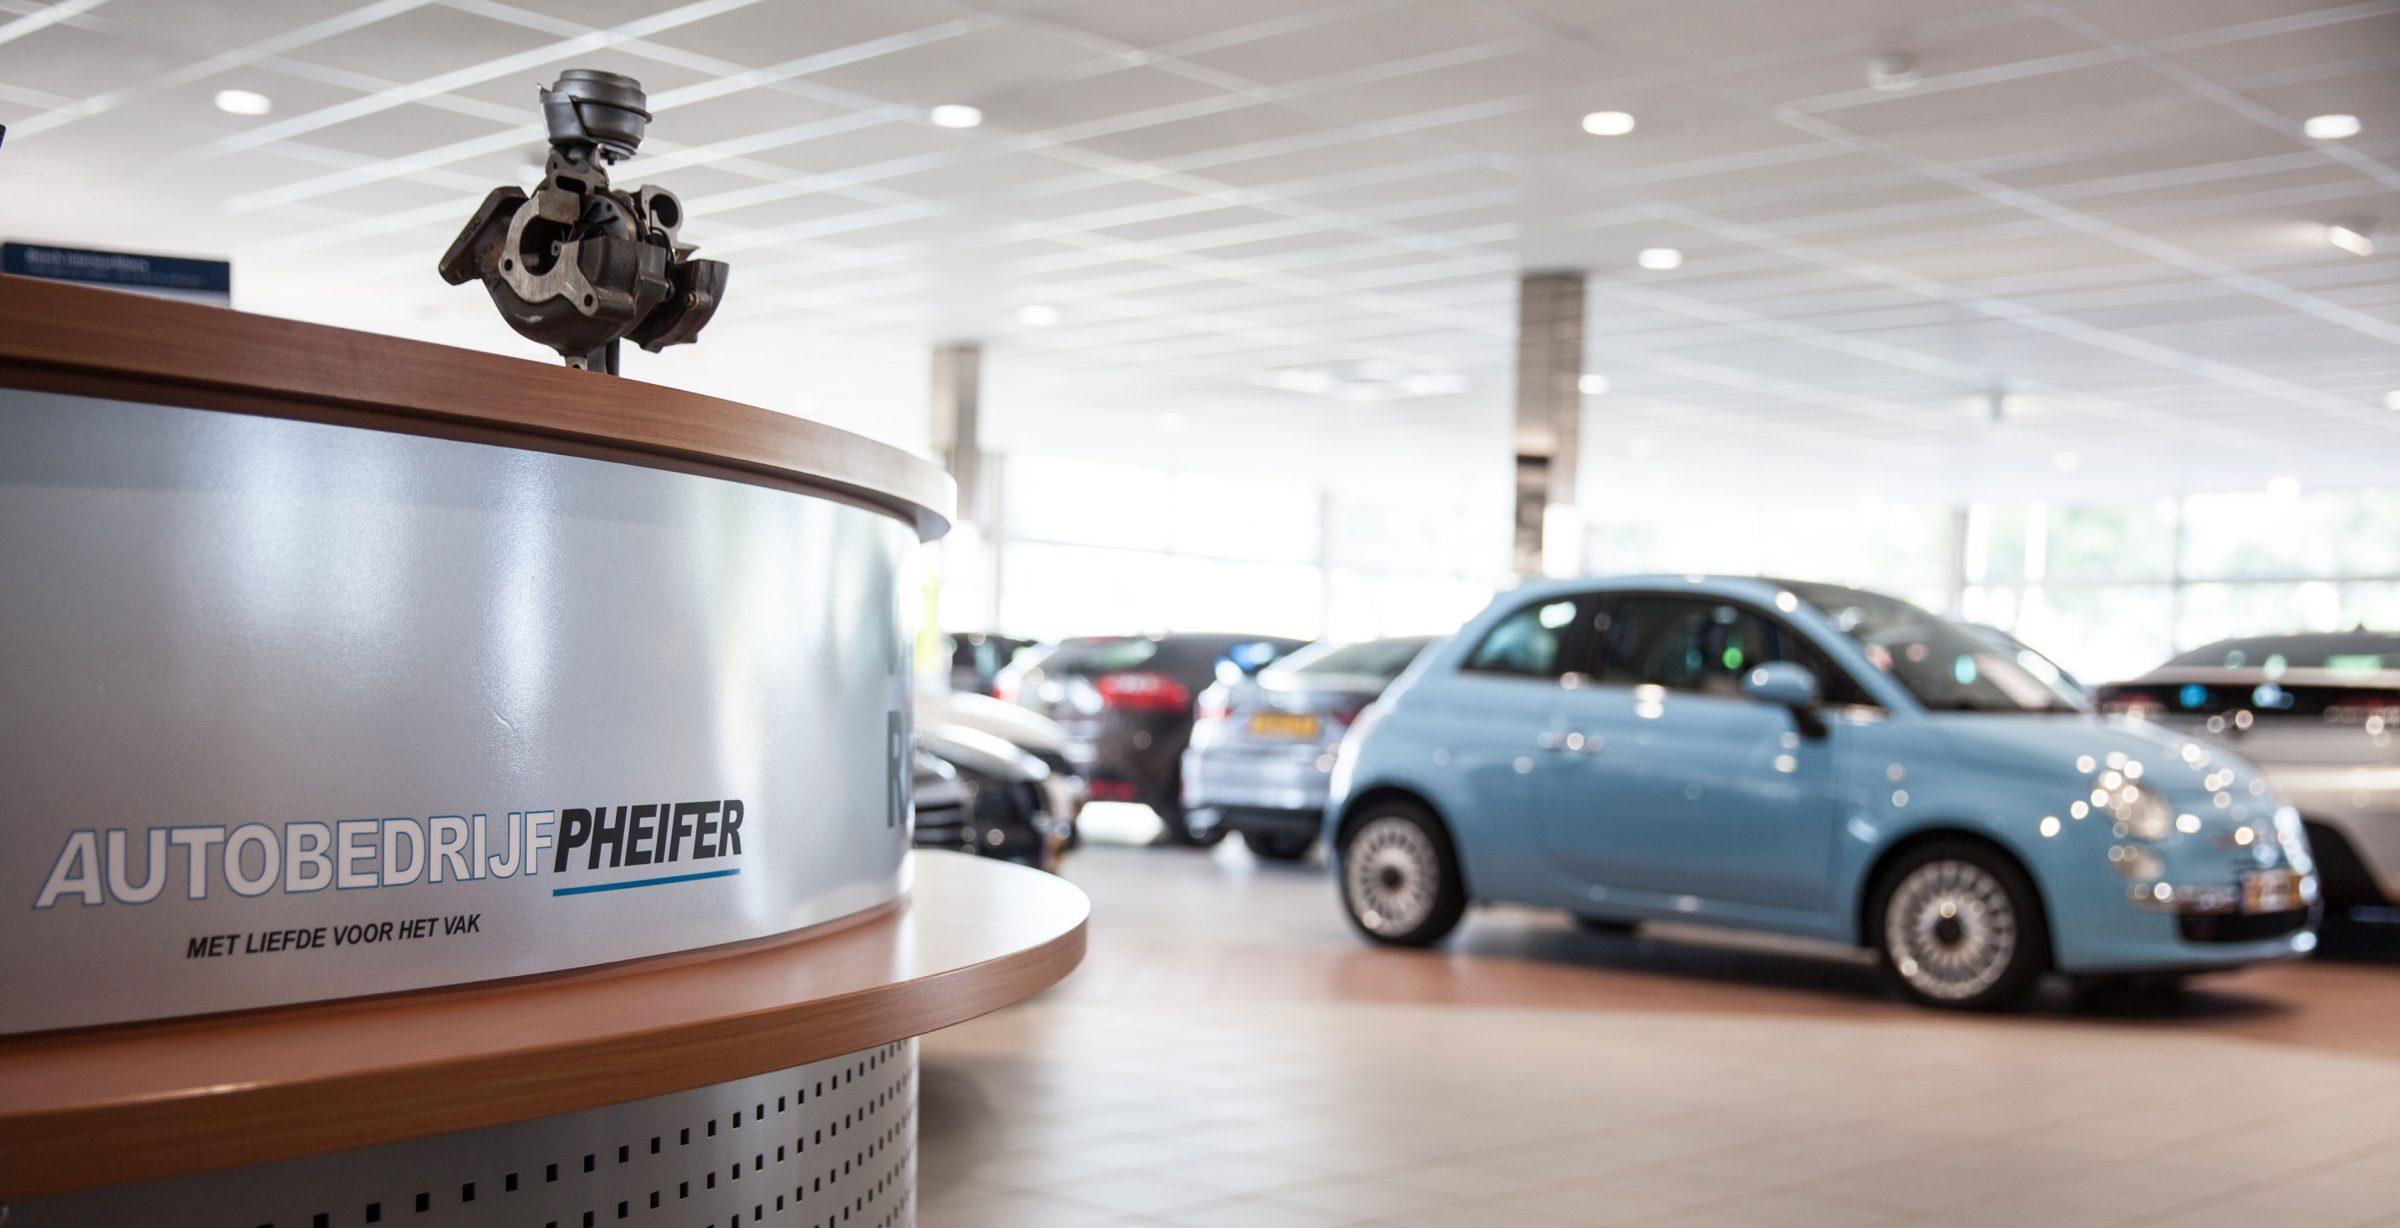 afspraak maken - Autobedrijf Pheifer